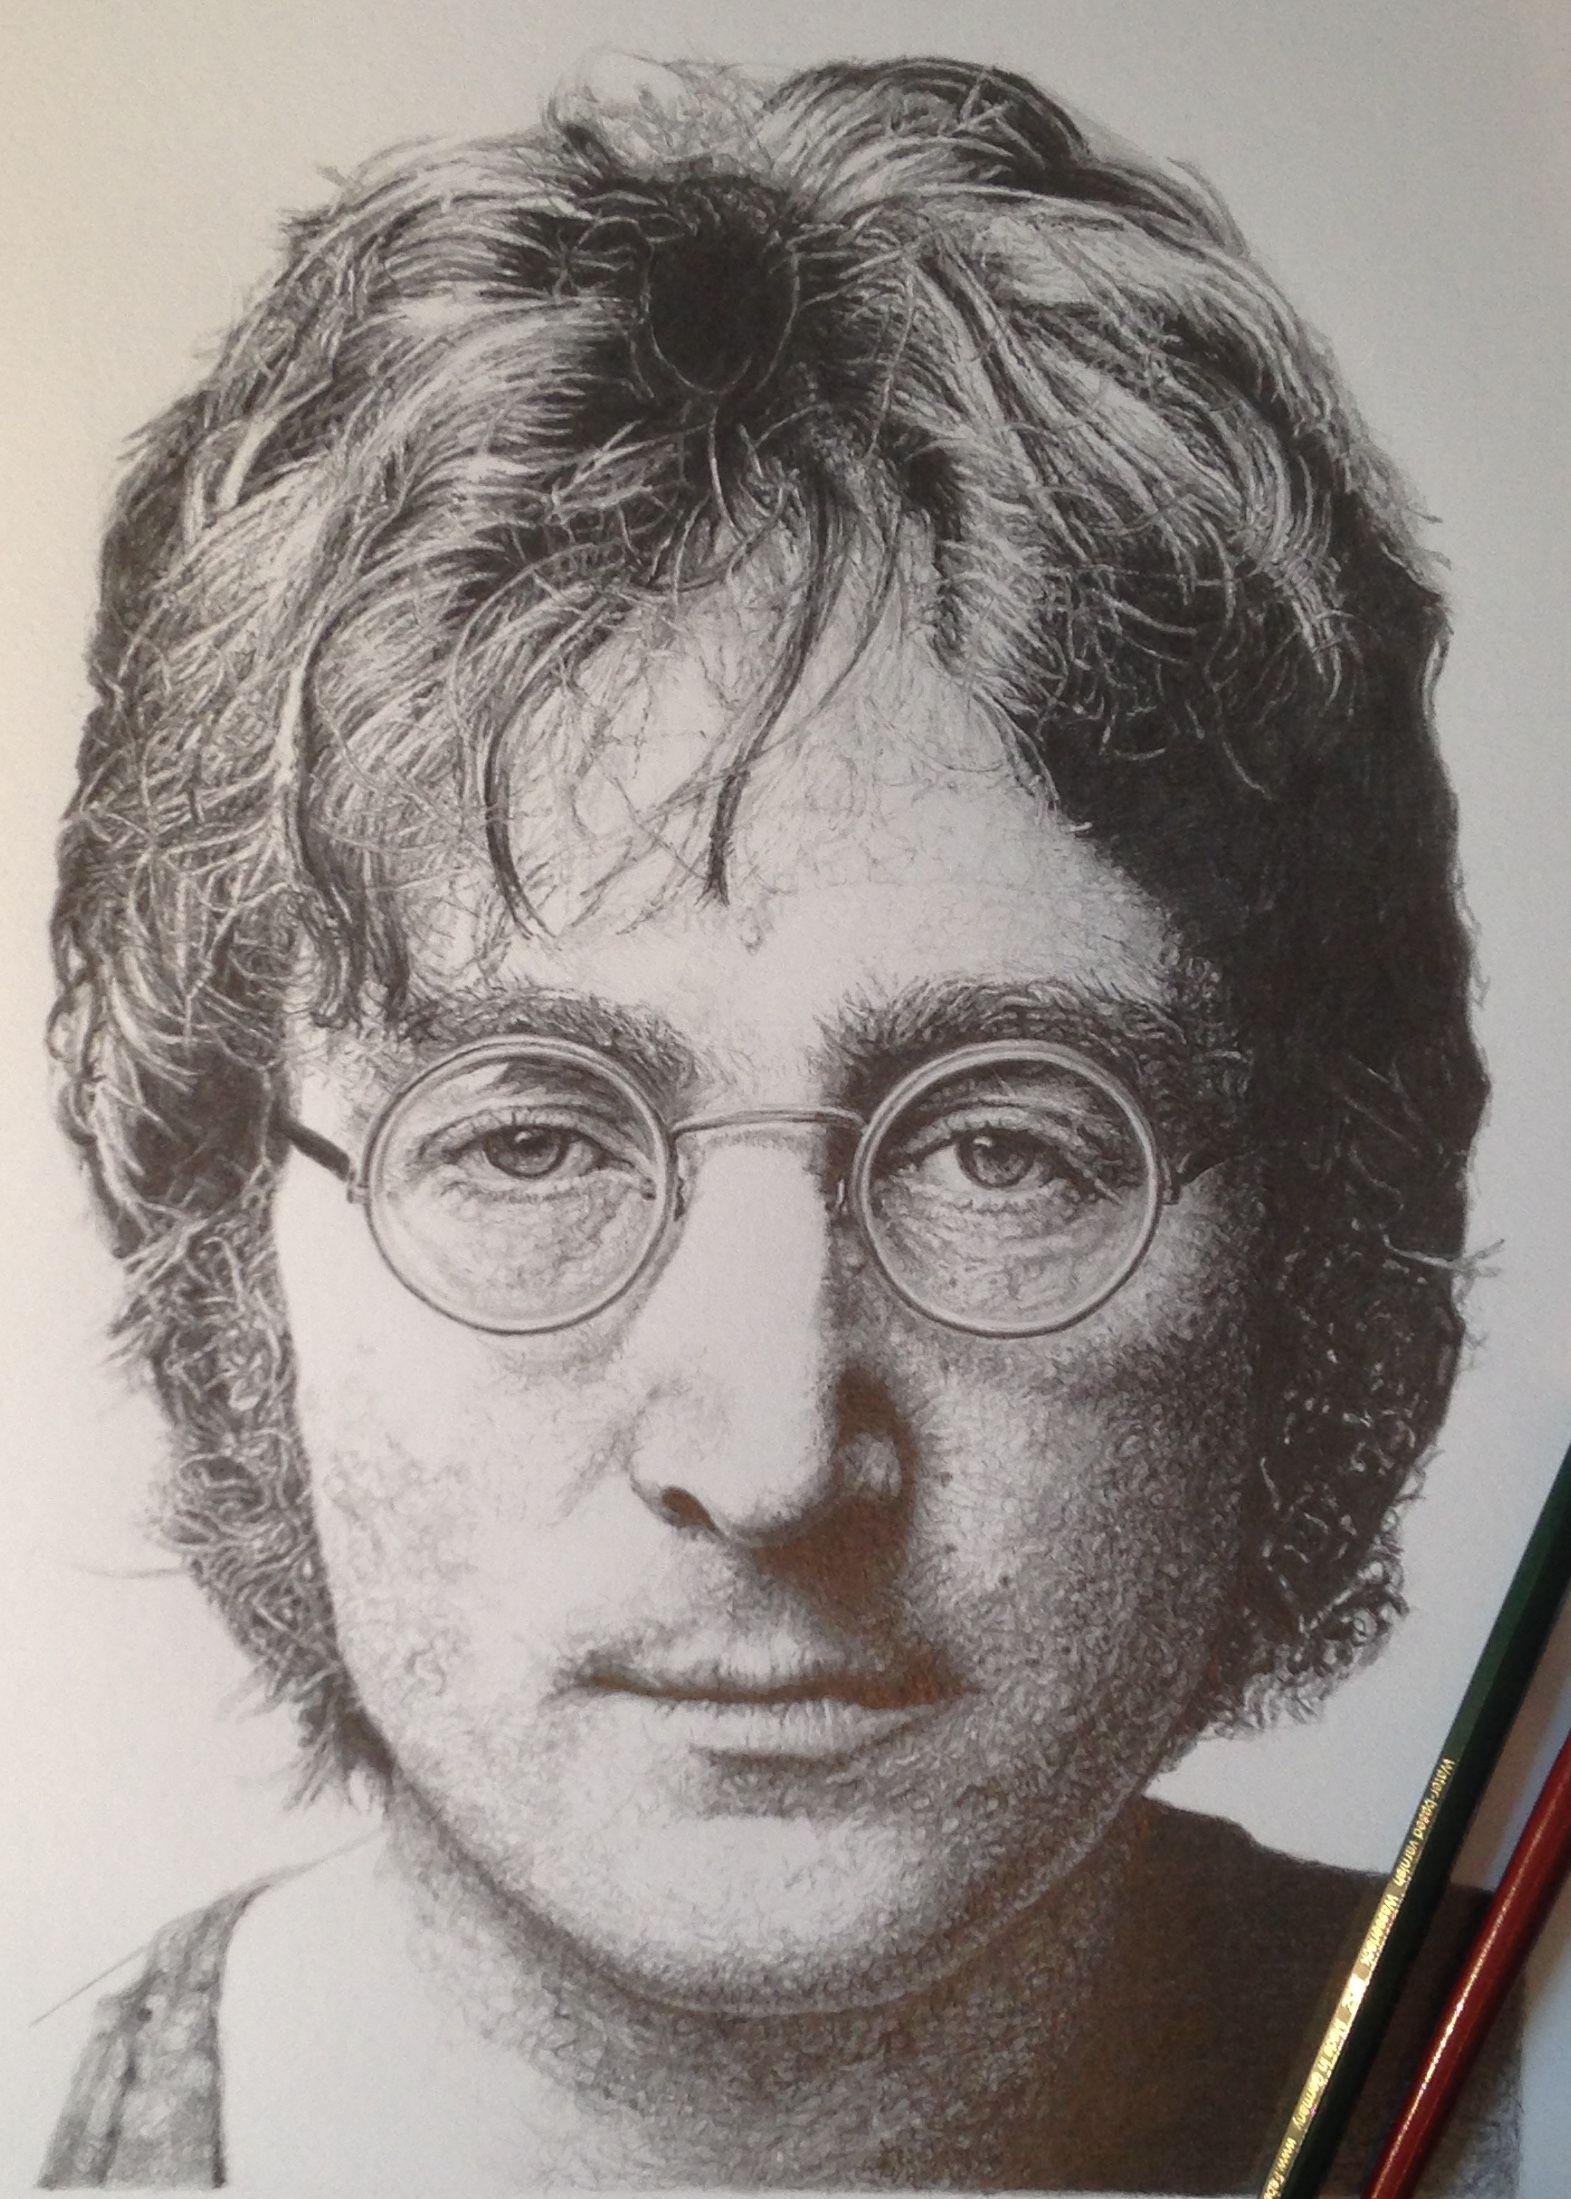 Wip johnlennon beatles pencil drawing portrait graphite wip johnlennon beatles pencil drawing portrait graphite graphitedrawing ccuart Image collections